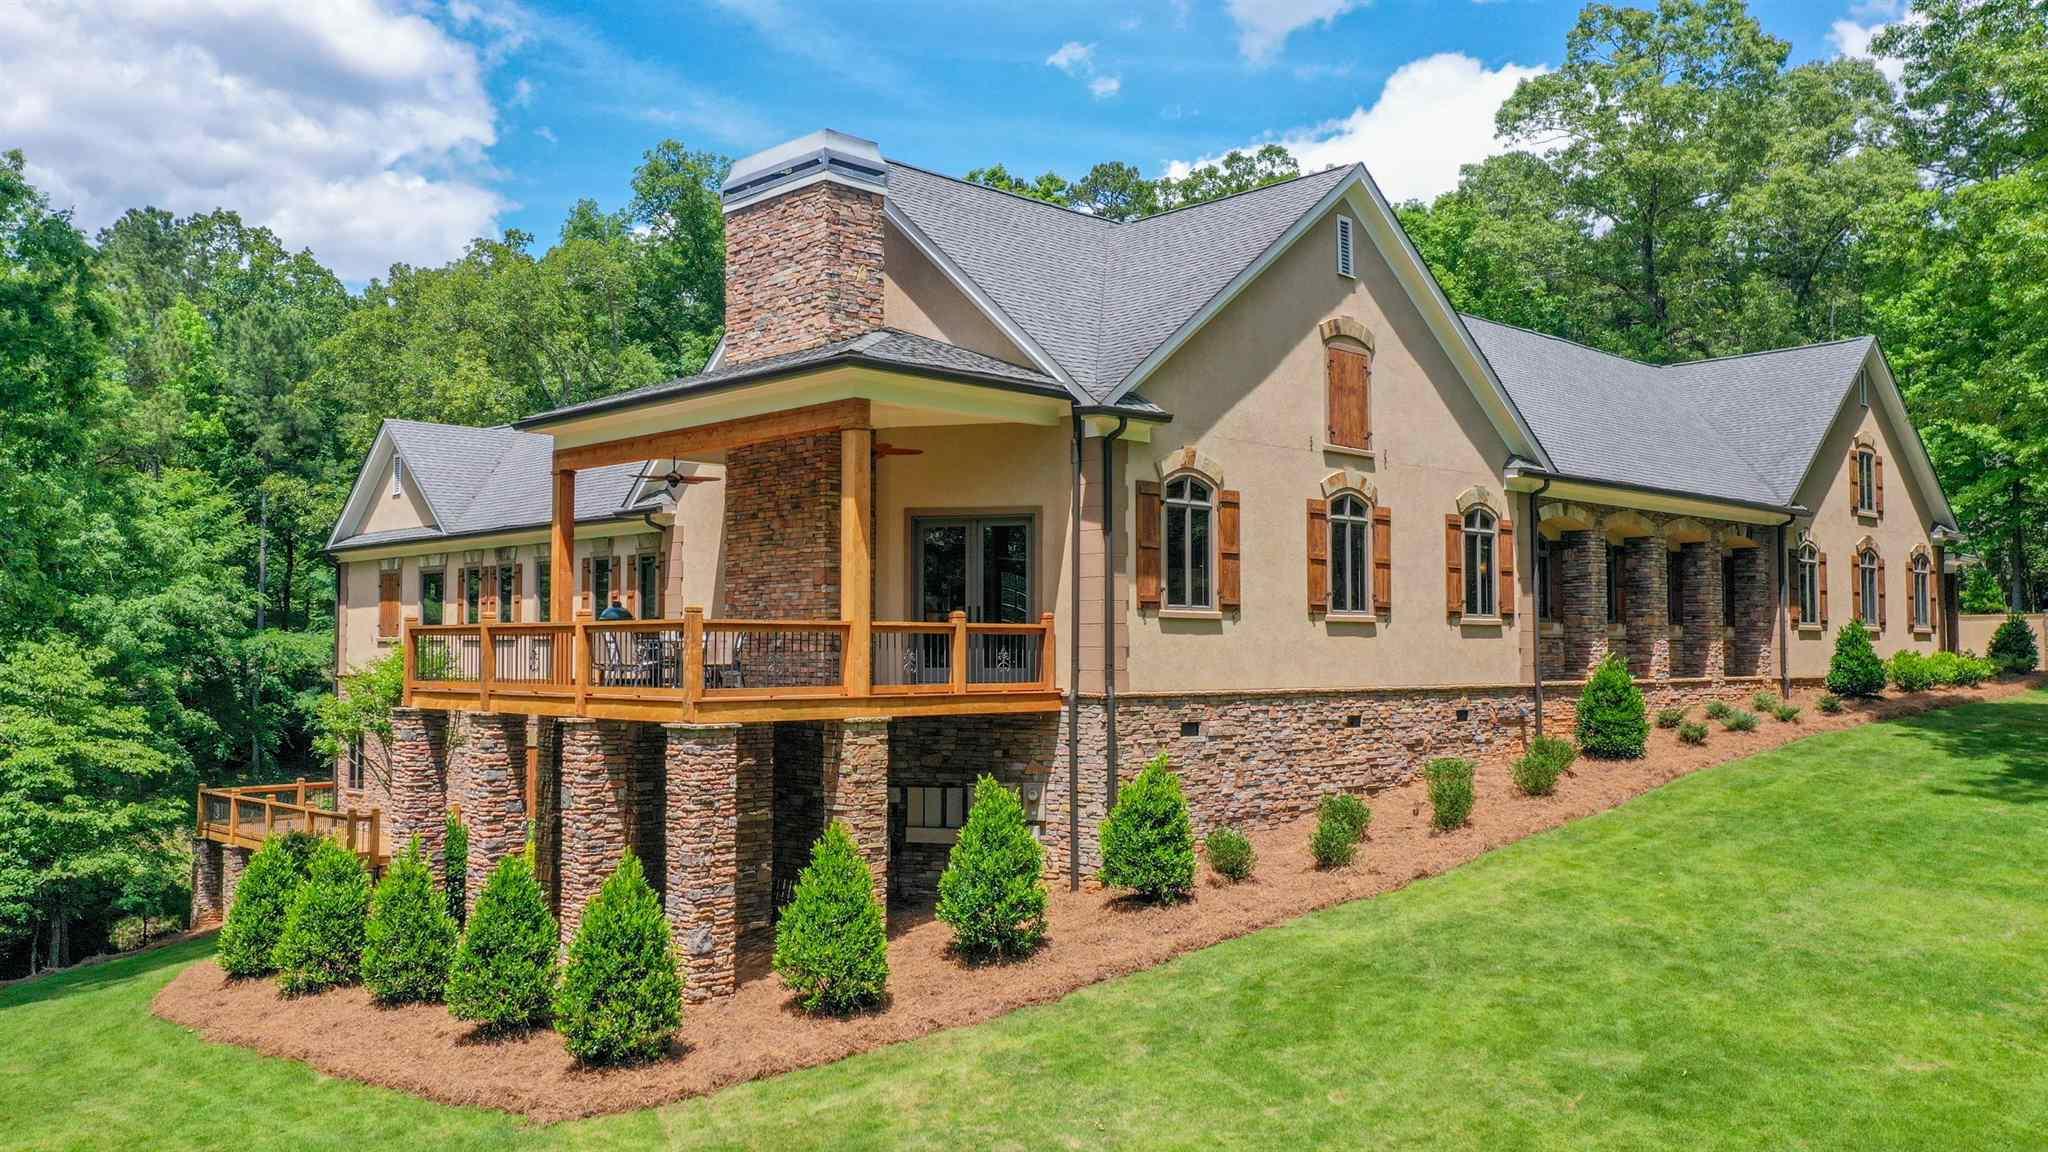 Property for sale at 1011 WALTON WAY, Greensboro,  Georgia 30642